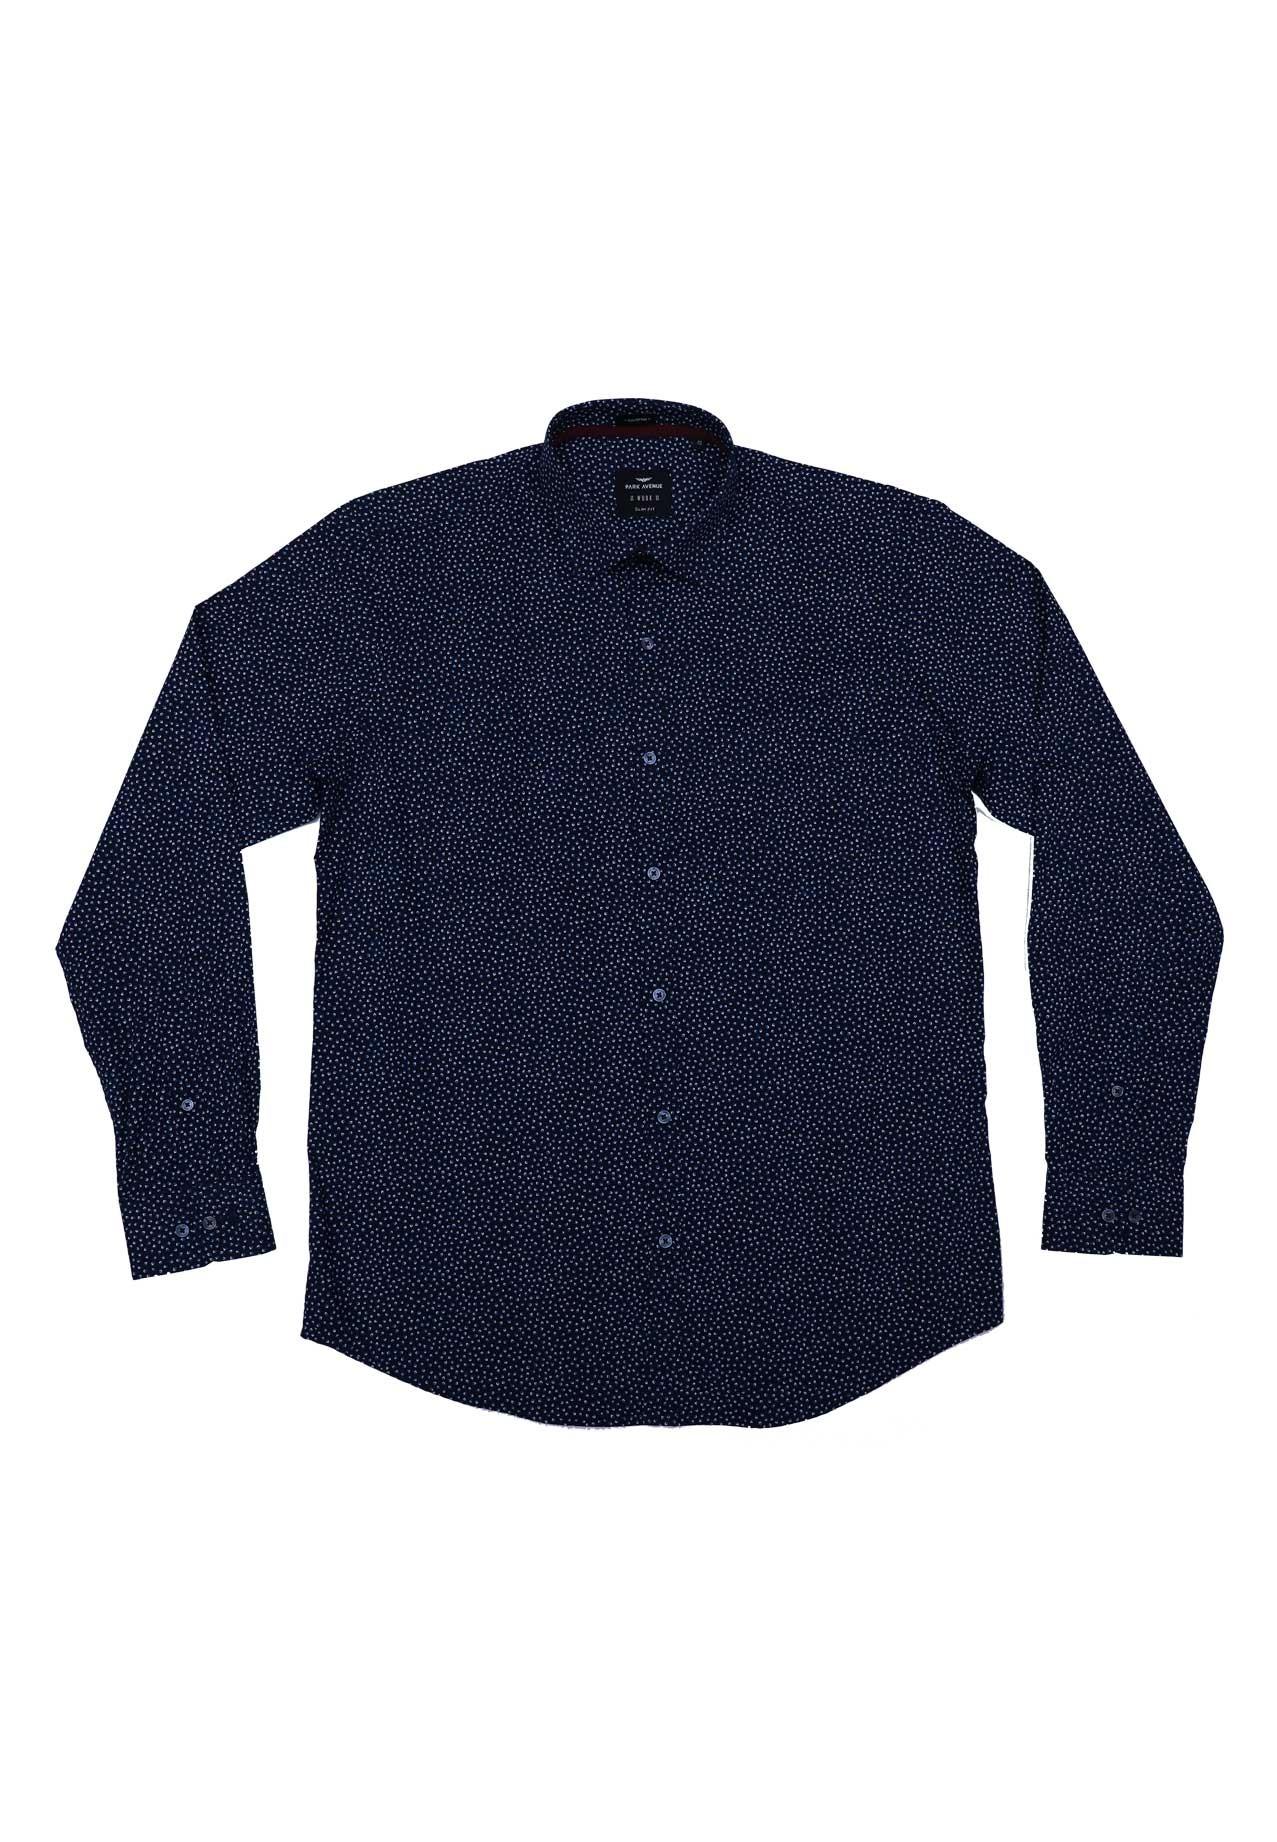 Park Avenue PMSY12376-B8 Mens Shirt, Size 44